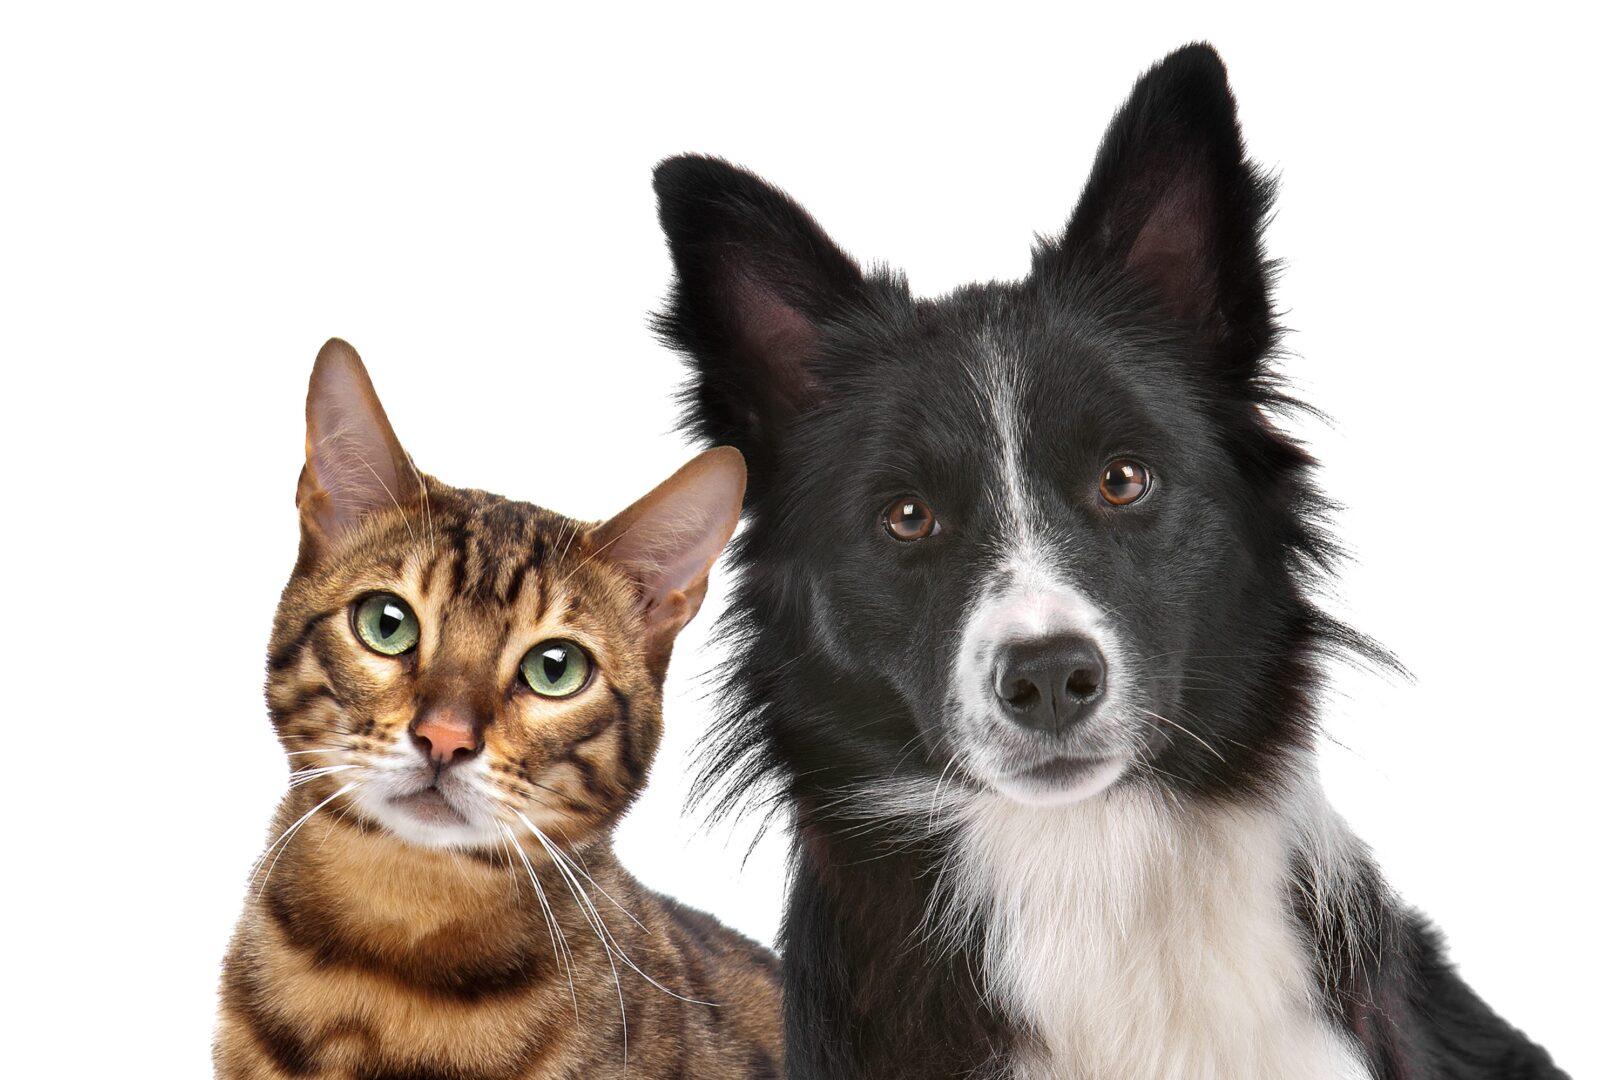 Cats & Dogs Statistics